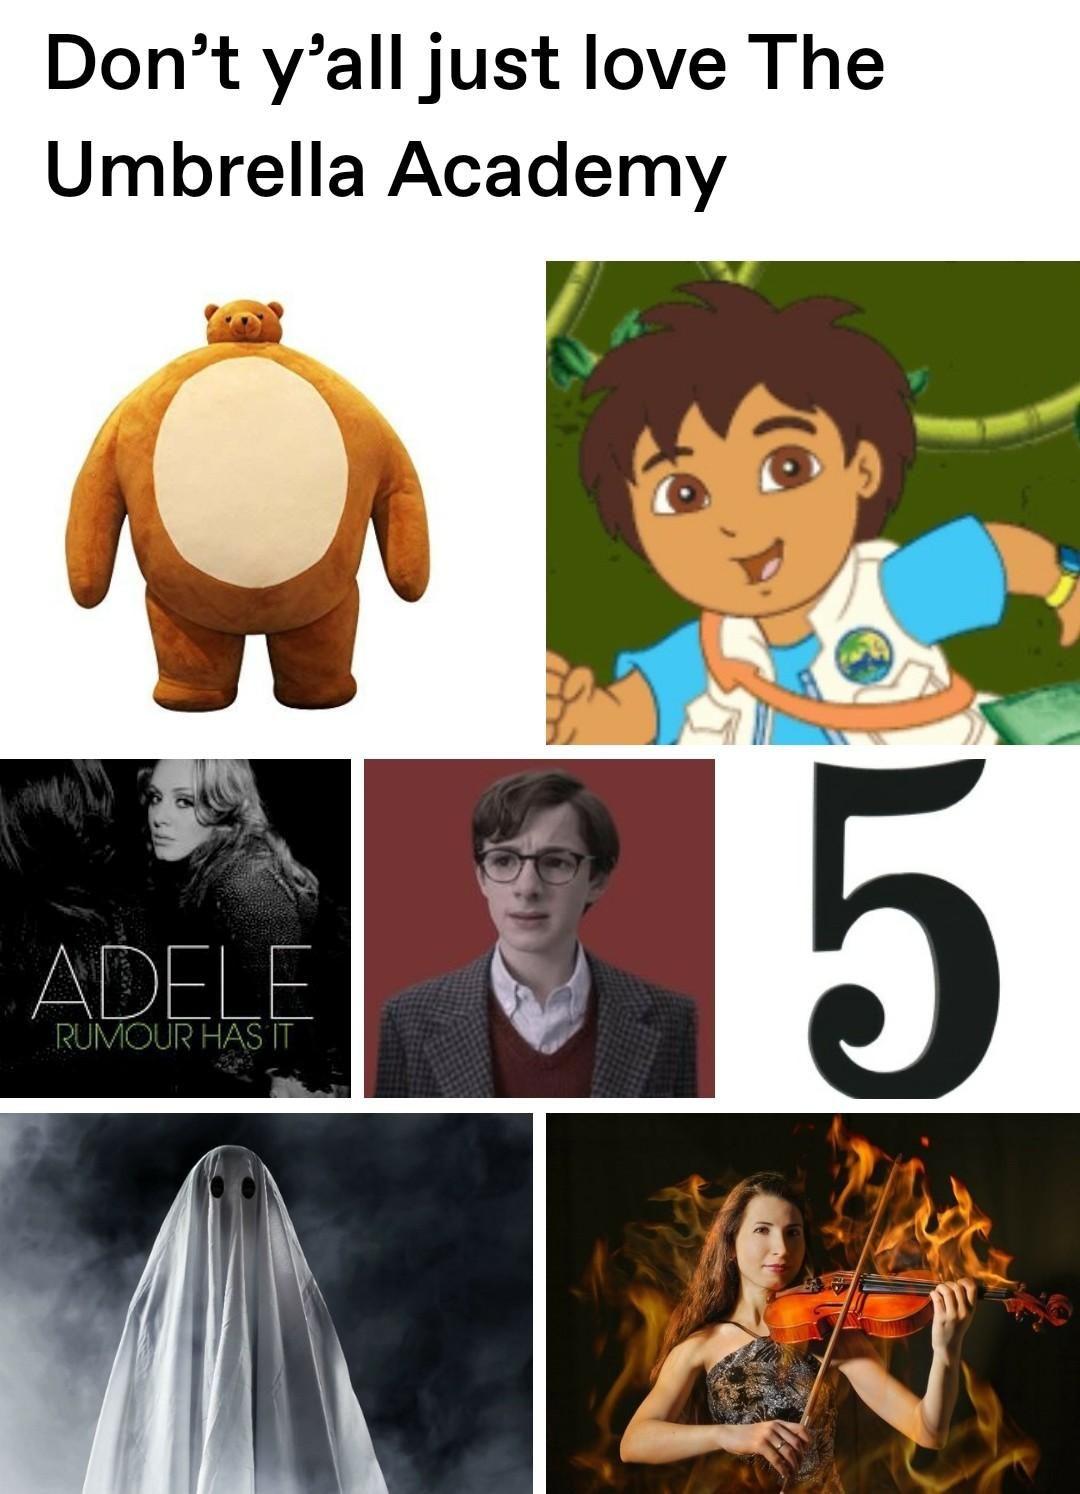 The Umbrella Academy Memes Google Search Funny Umbrella Umbrella Academy